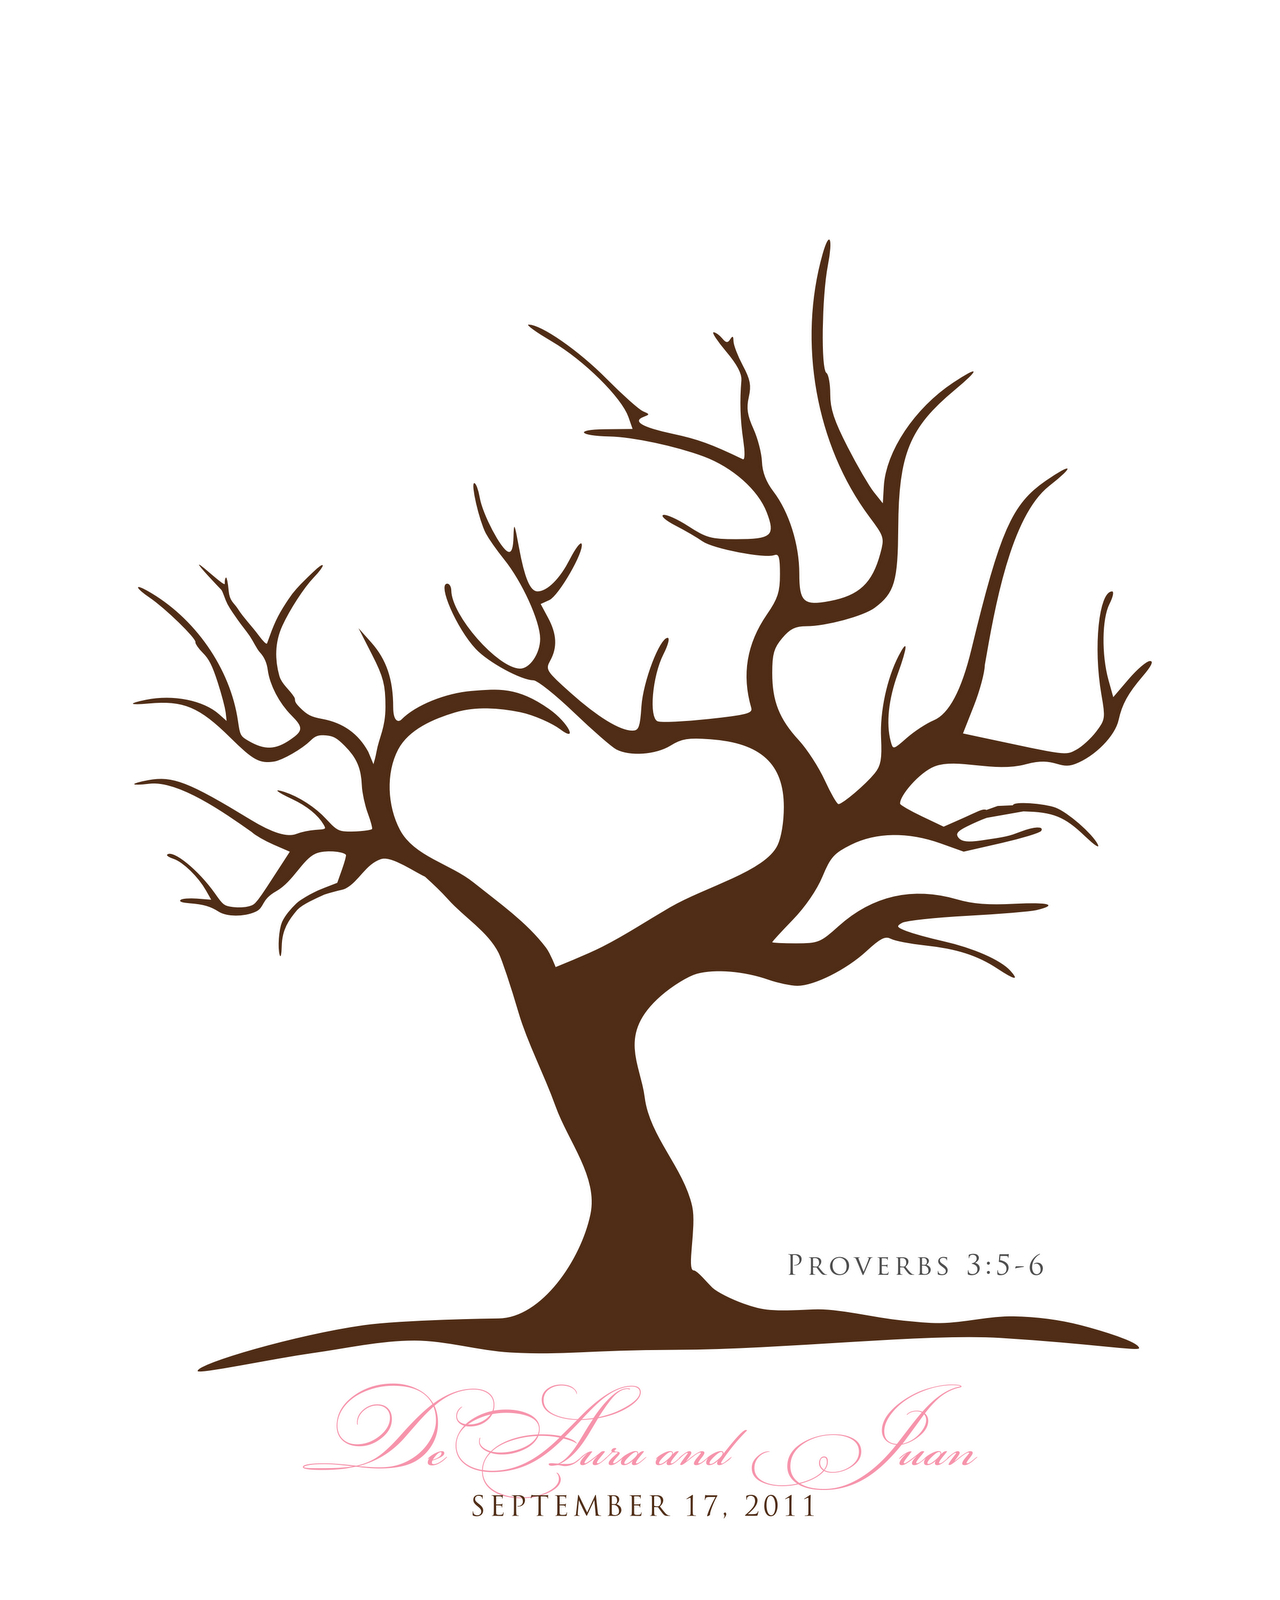 Free Printable Fingerprint Tree Template   Embroidery   Pinterest - Free Printable Tree Template